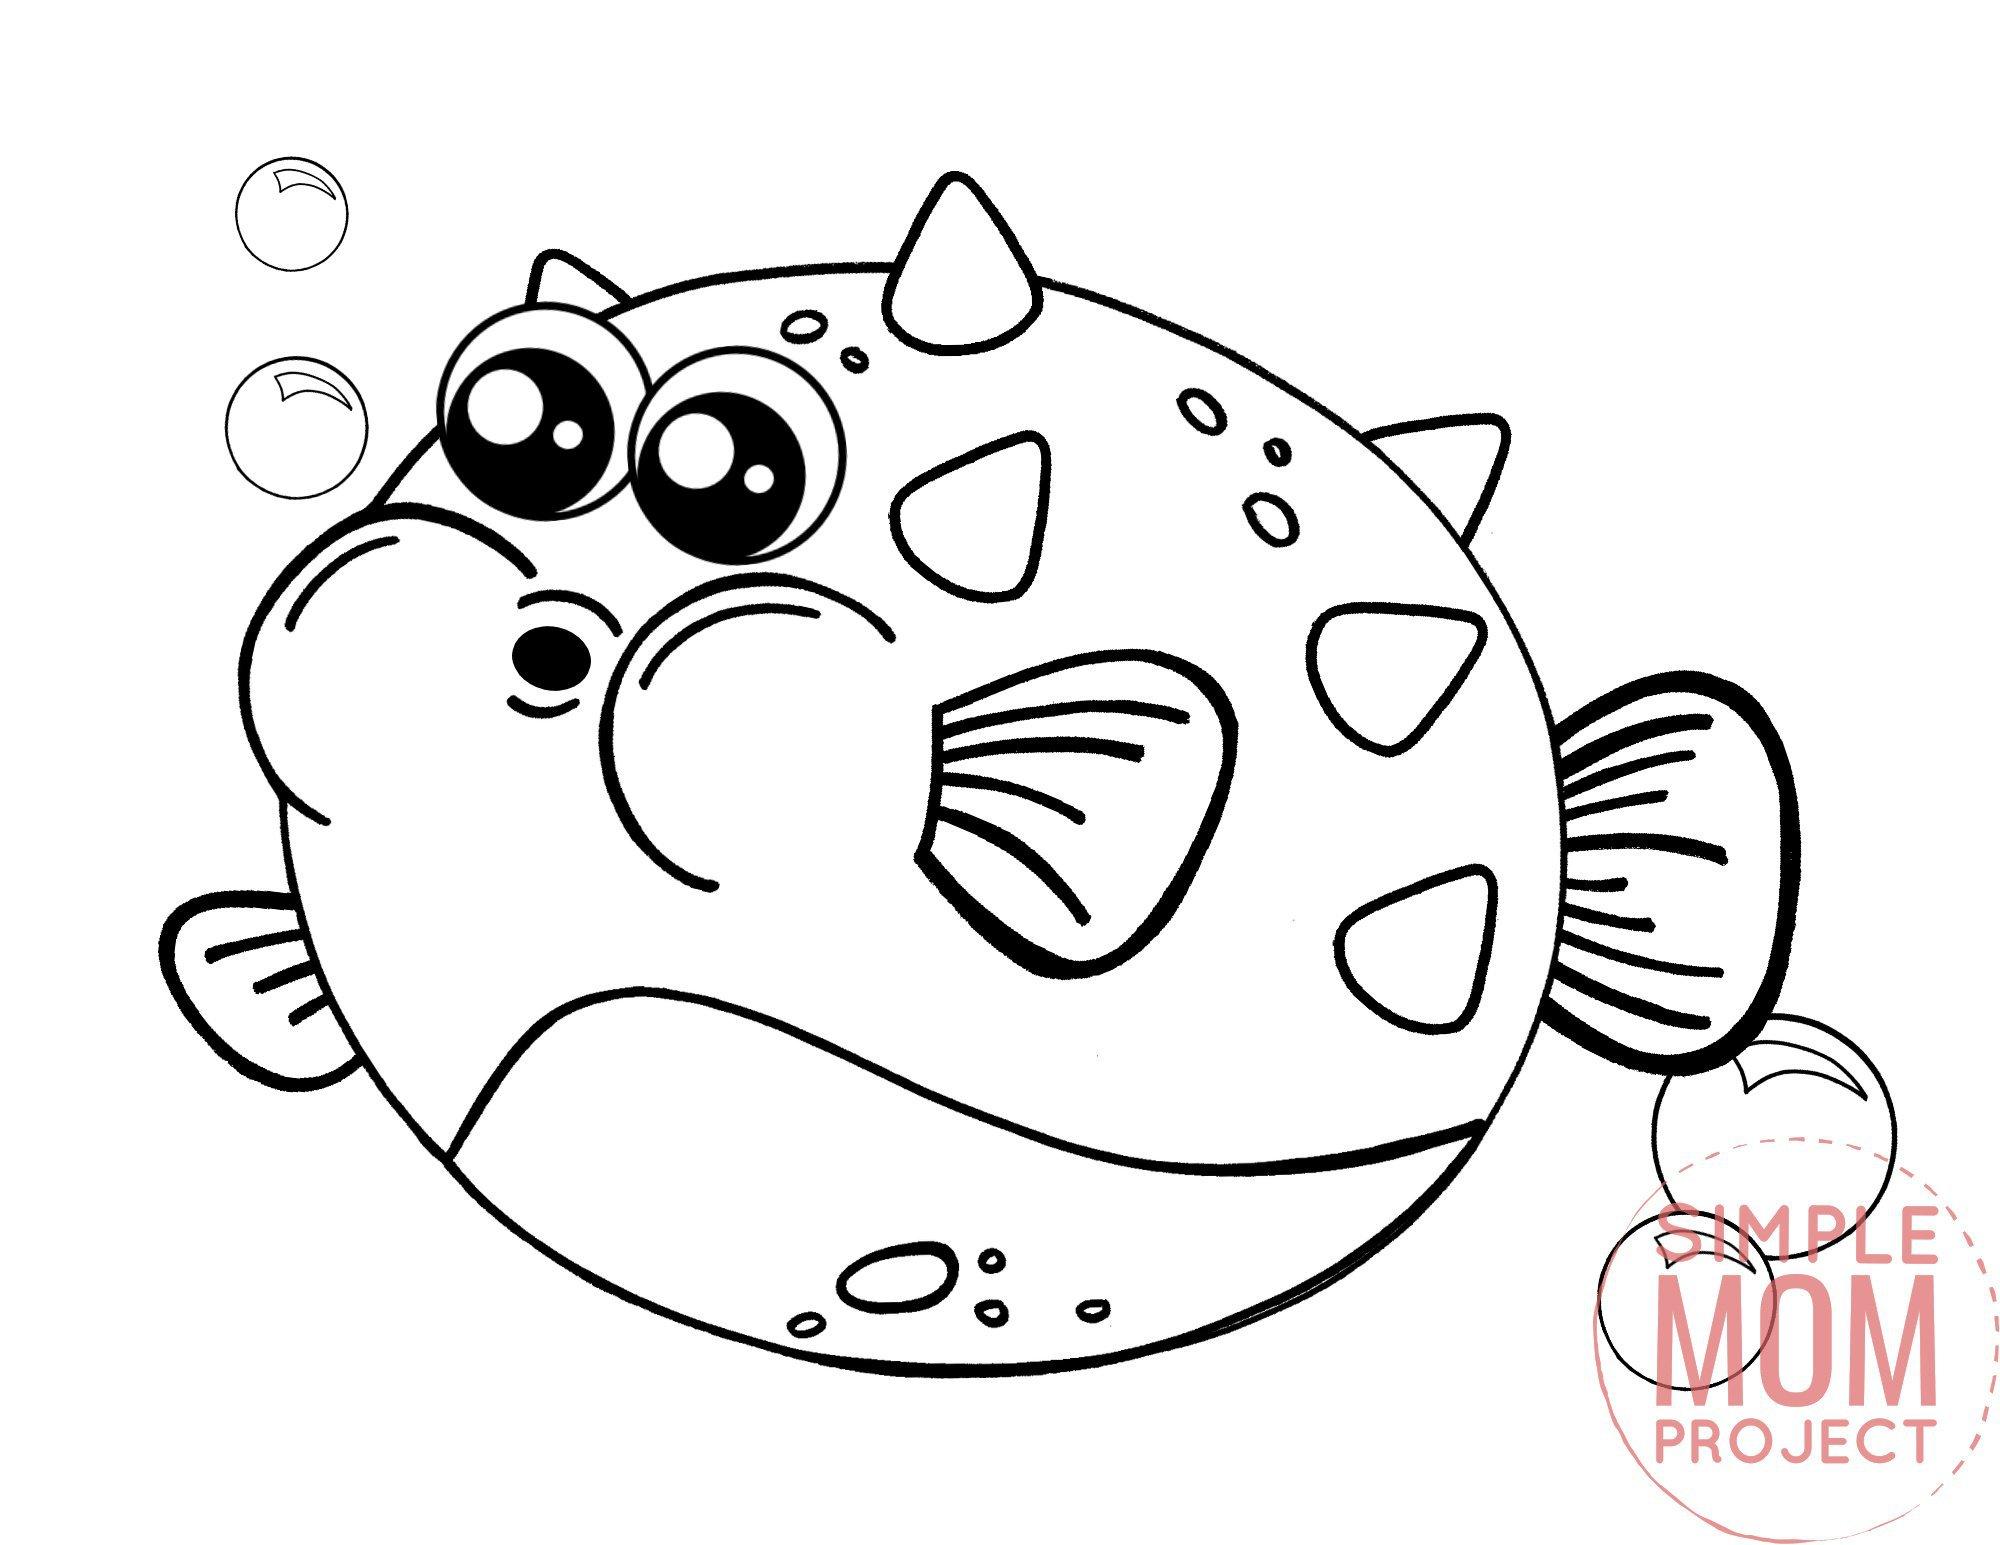 Printable Blowfish Ocean Animal Coloring Page for Kids